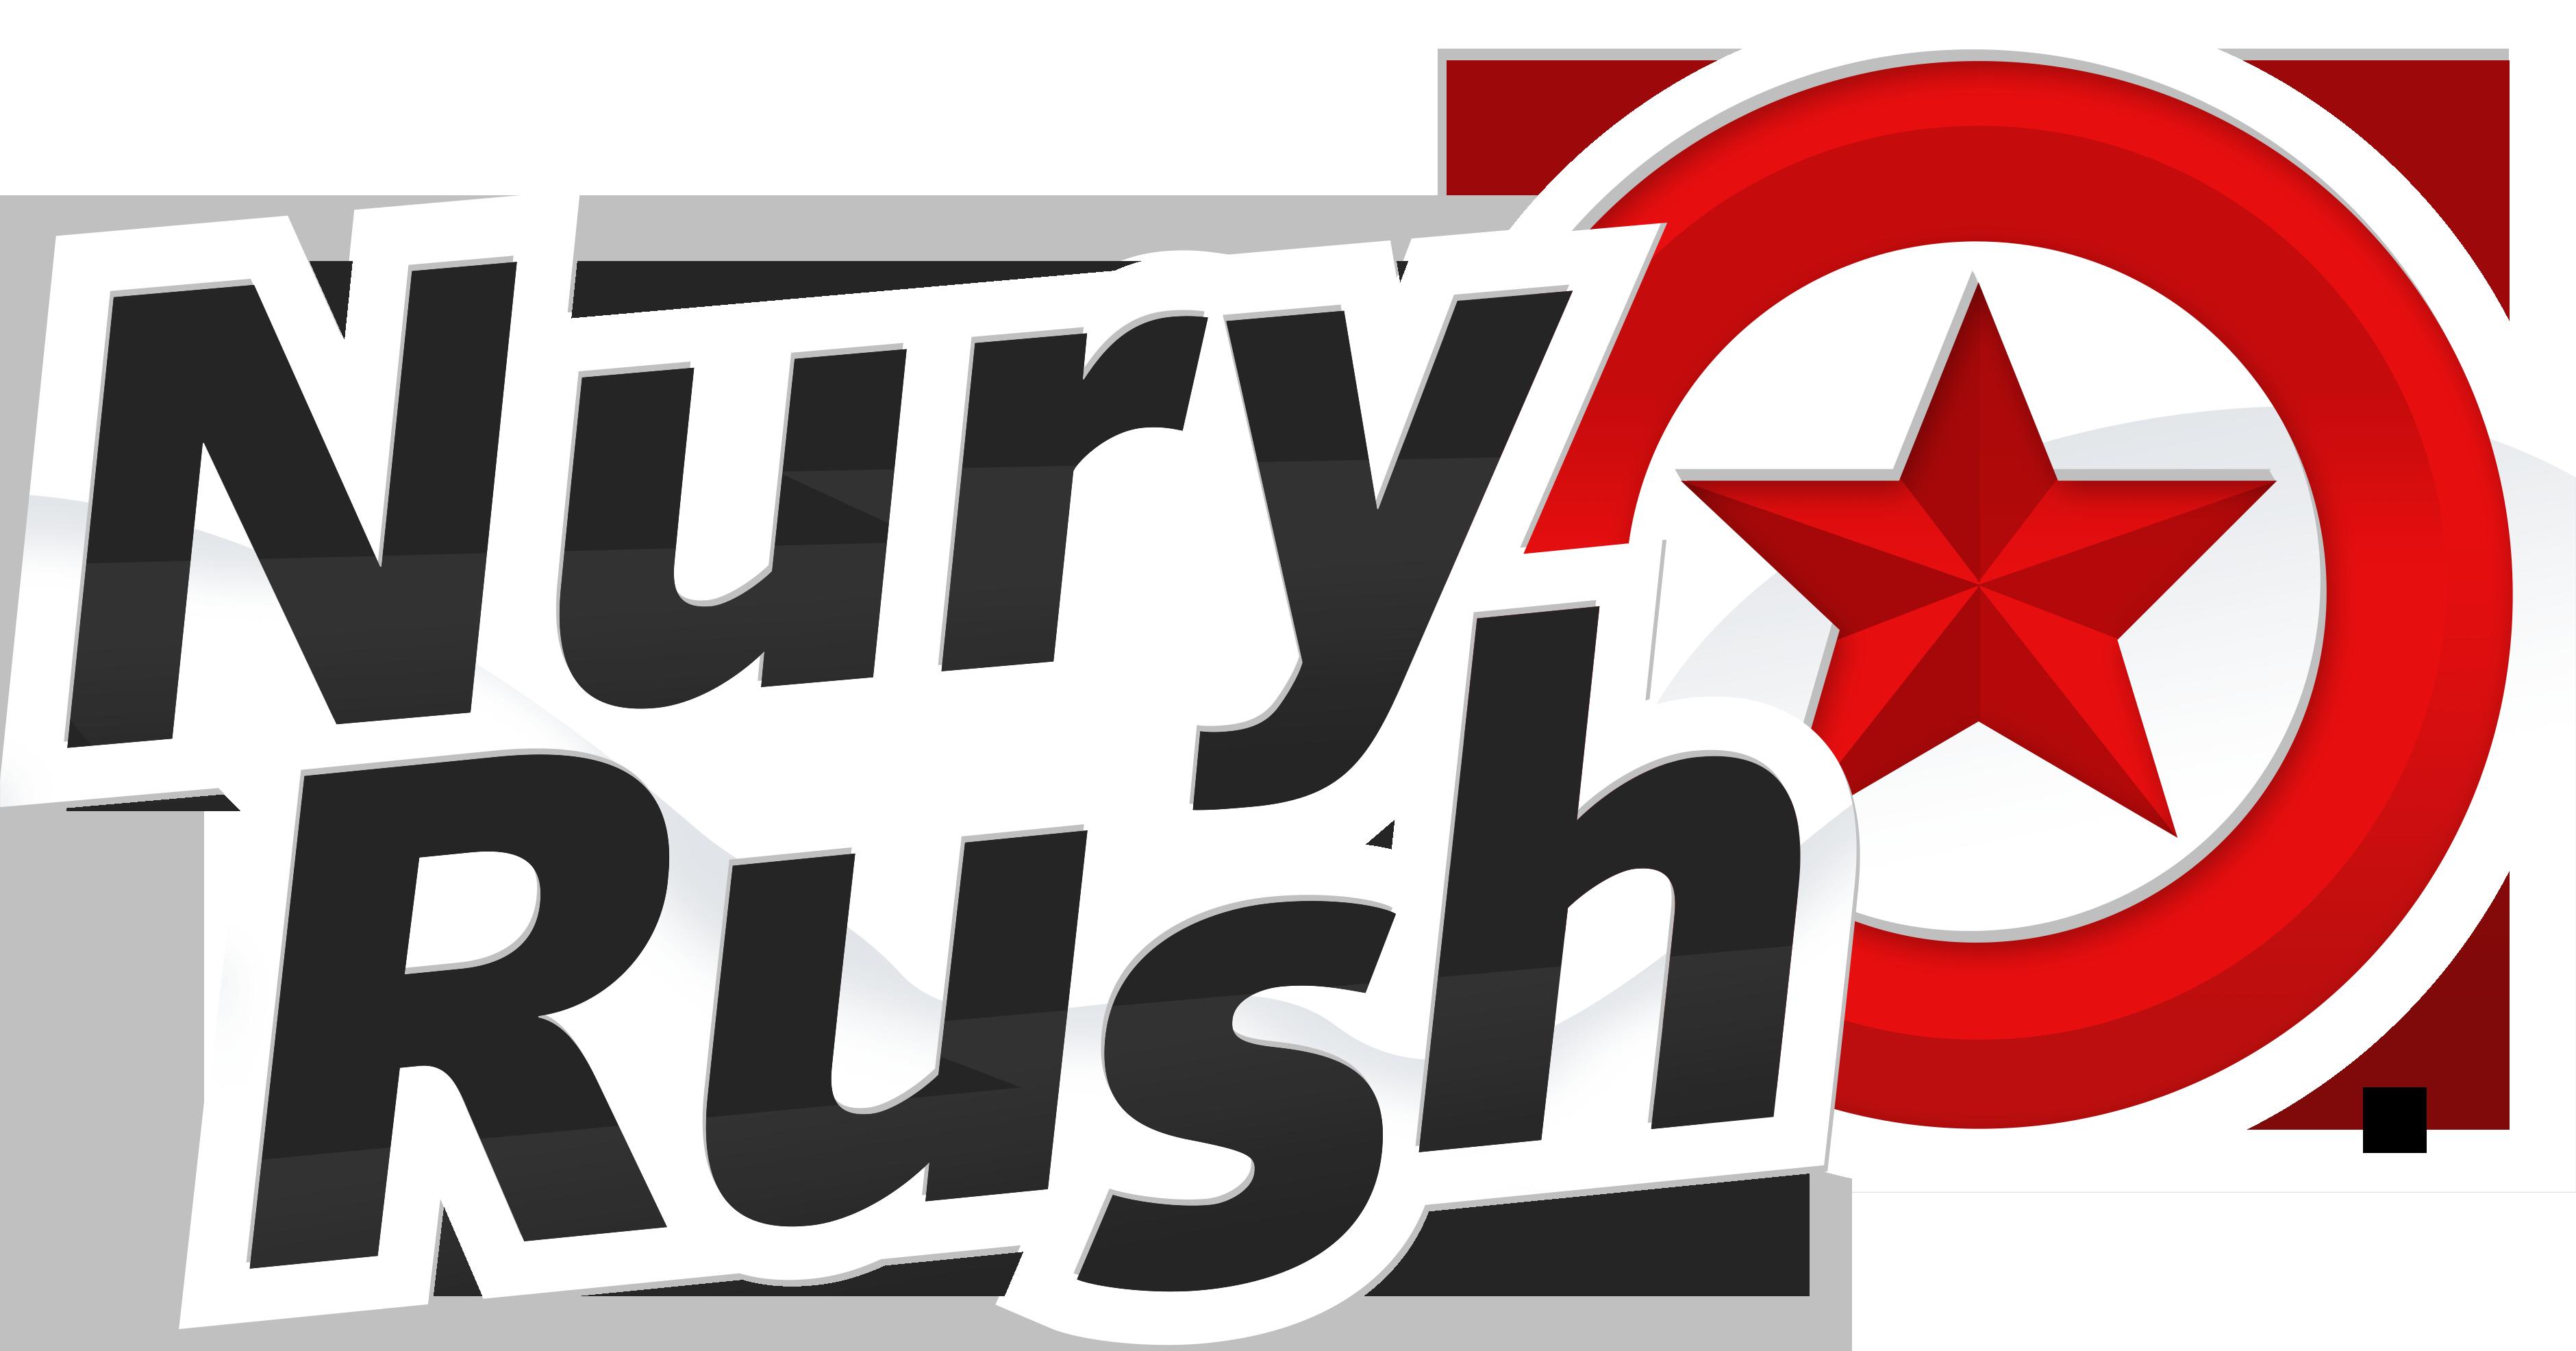 NuryRush Logo by NuryRush